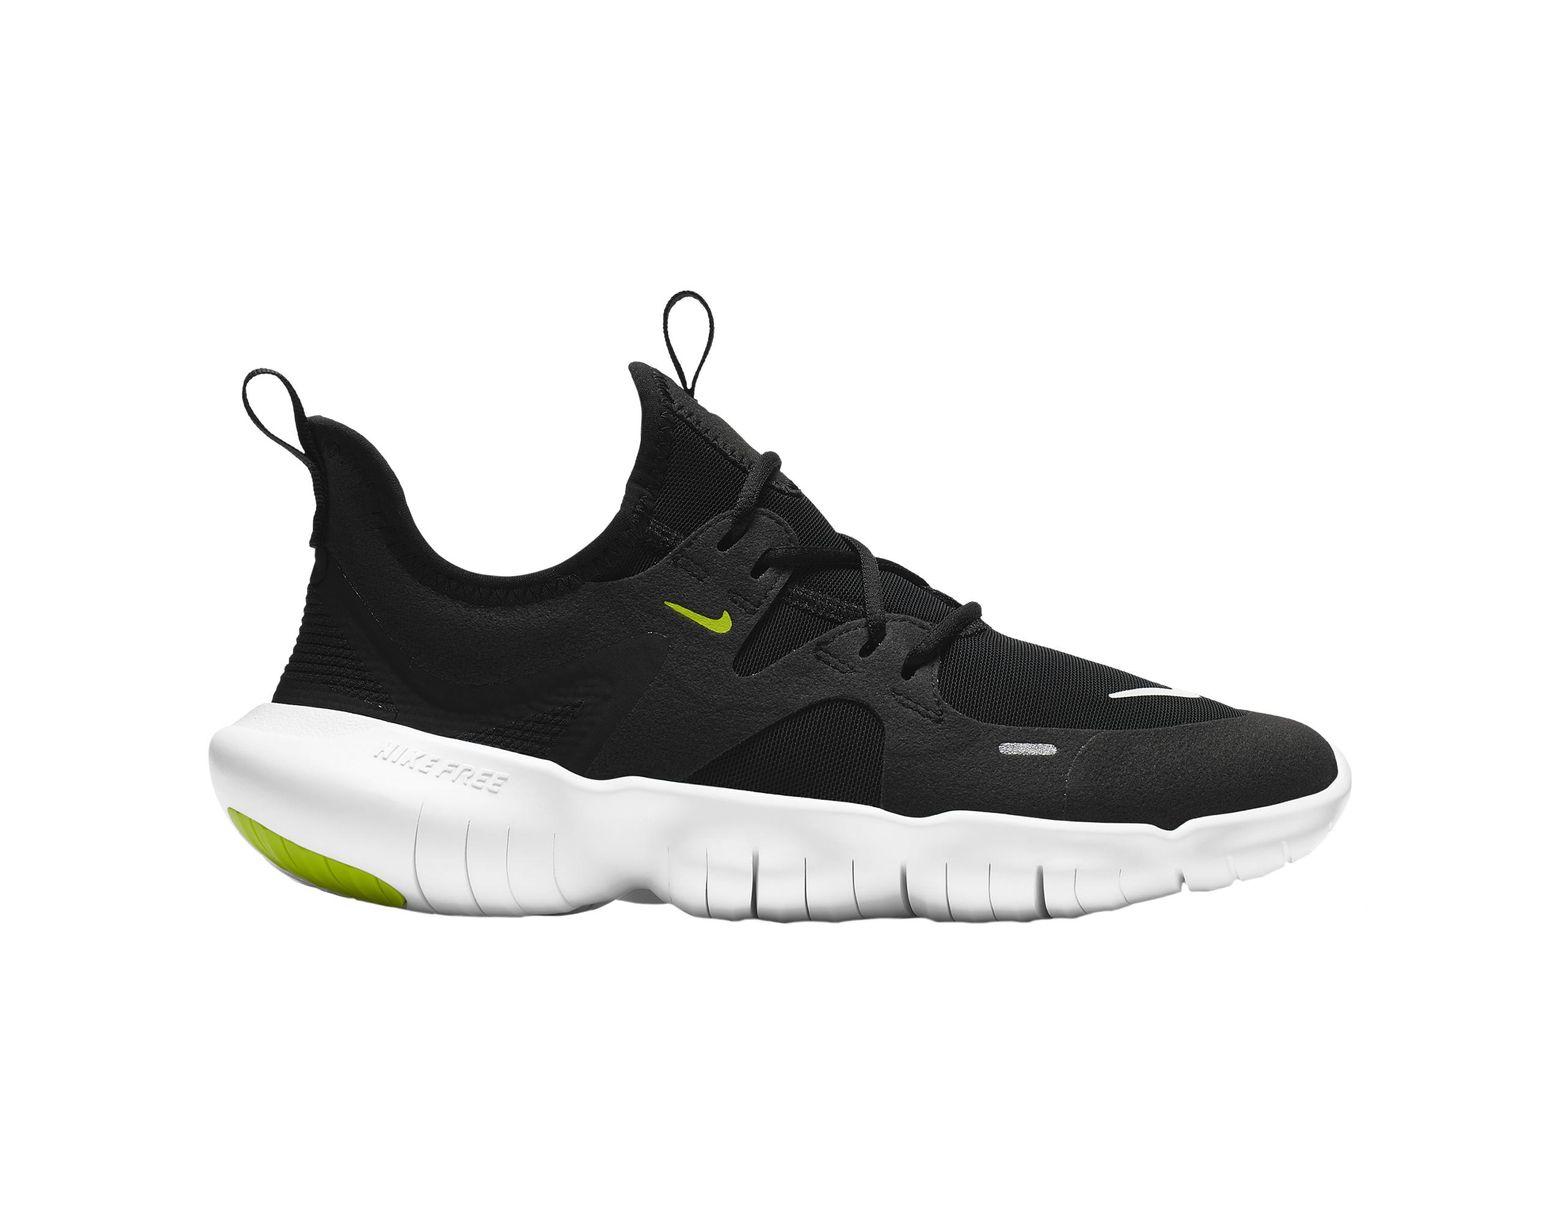 buy popular 5db52 4289a Nike - Black Free Run 5.0 Running Shoes for Men - Lyst